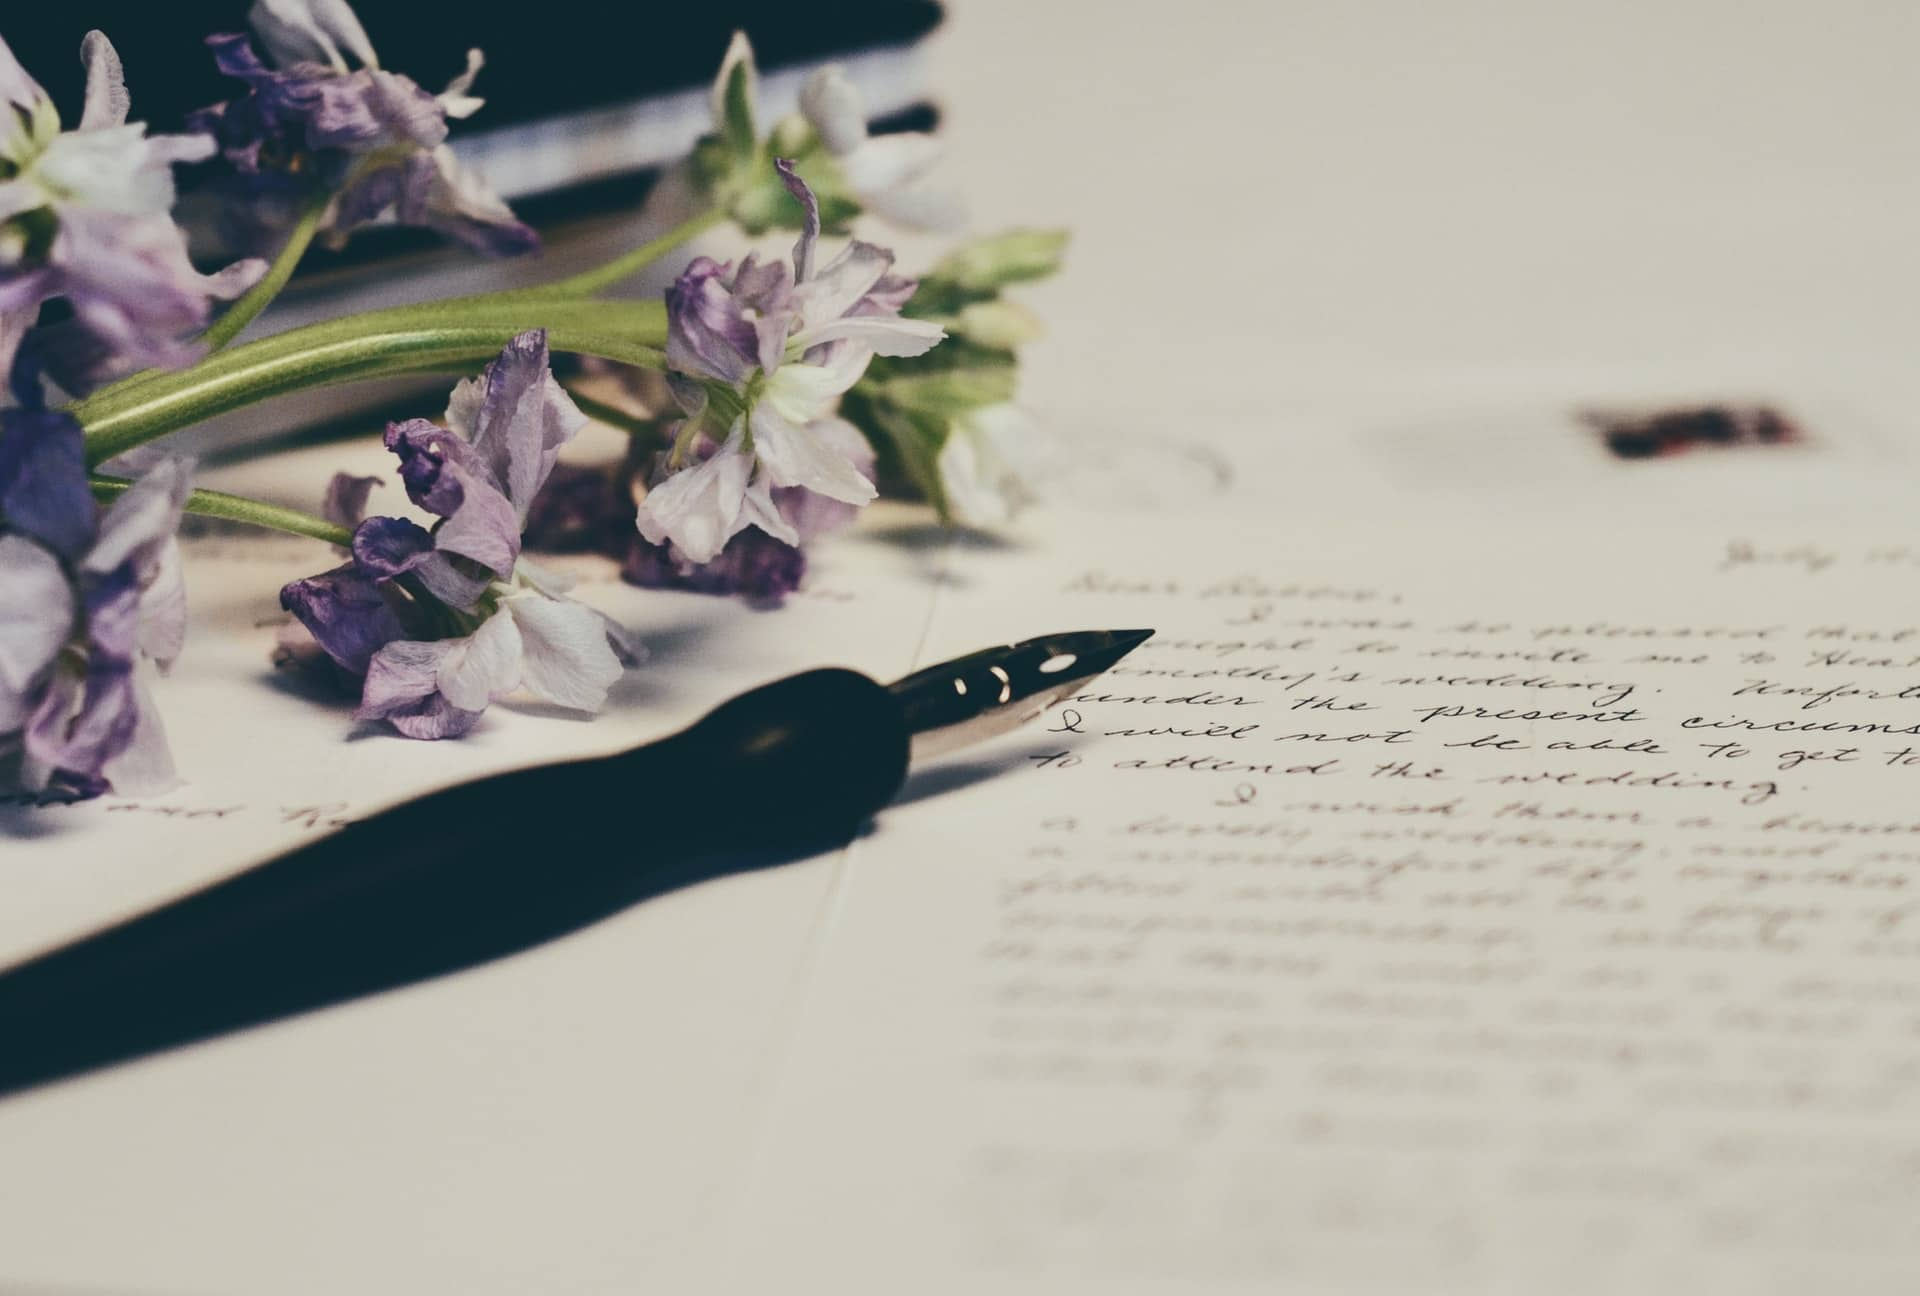 Image stylo plume